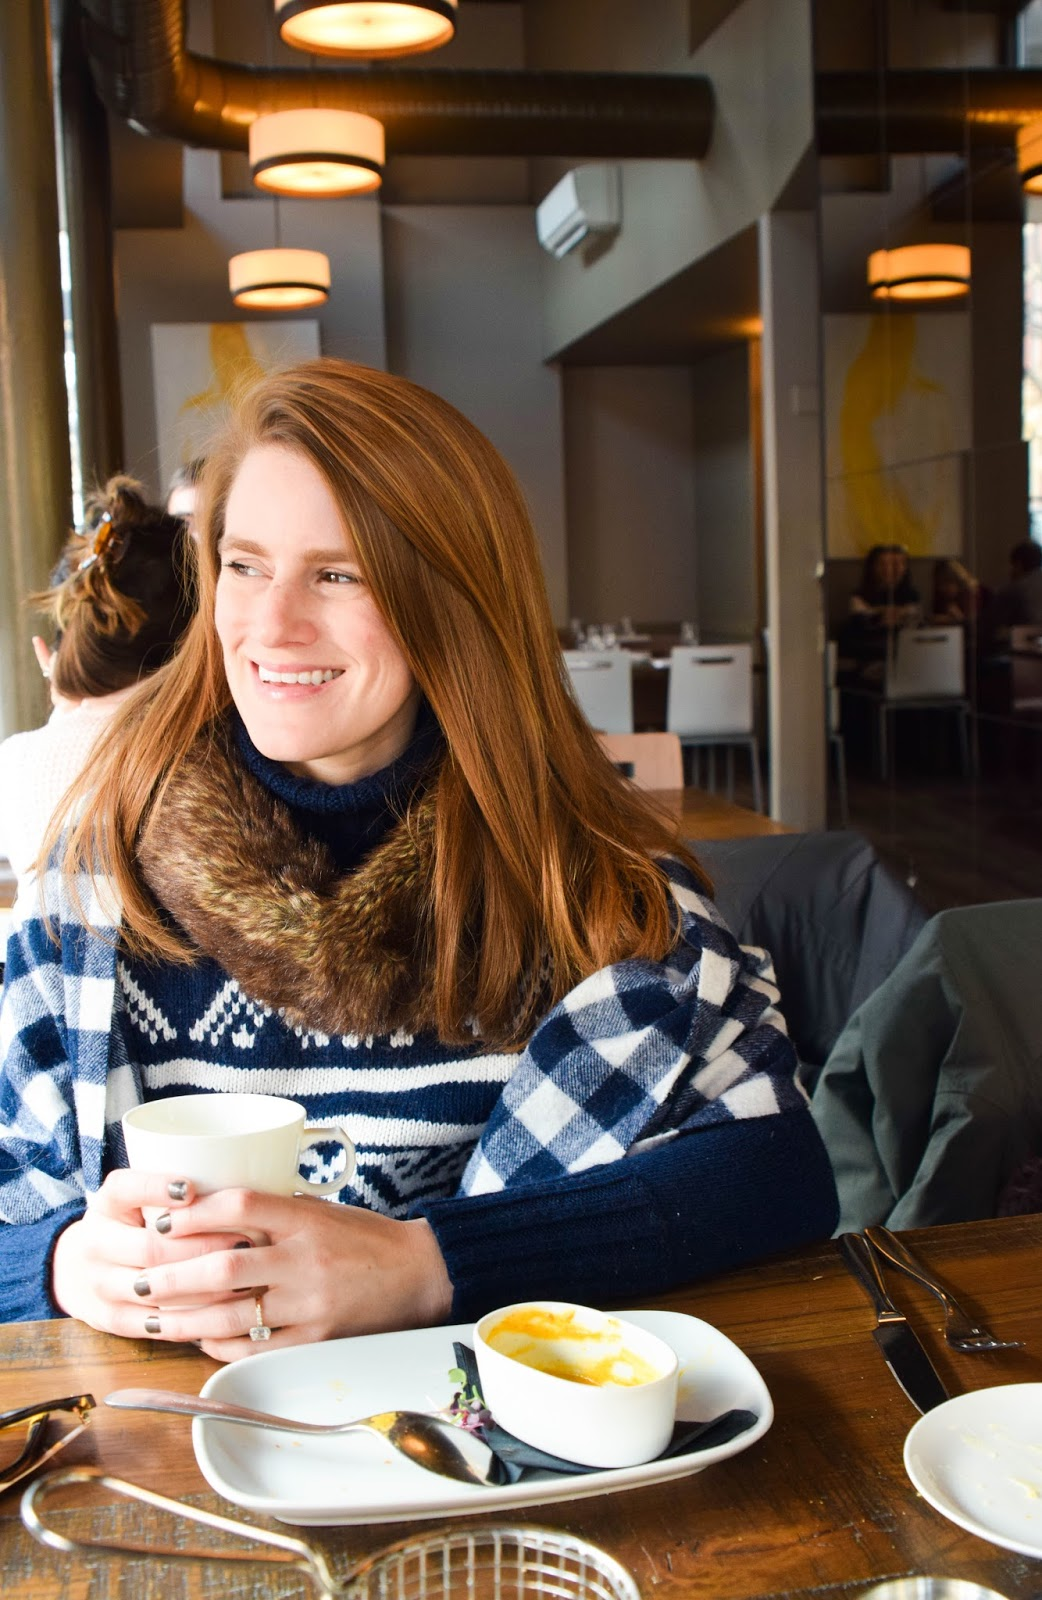 frederick maryland travel guide - visit frederick - frederick maryland brunch - romantic frederick maryland - the tasting room